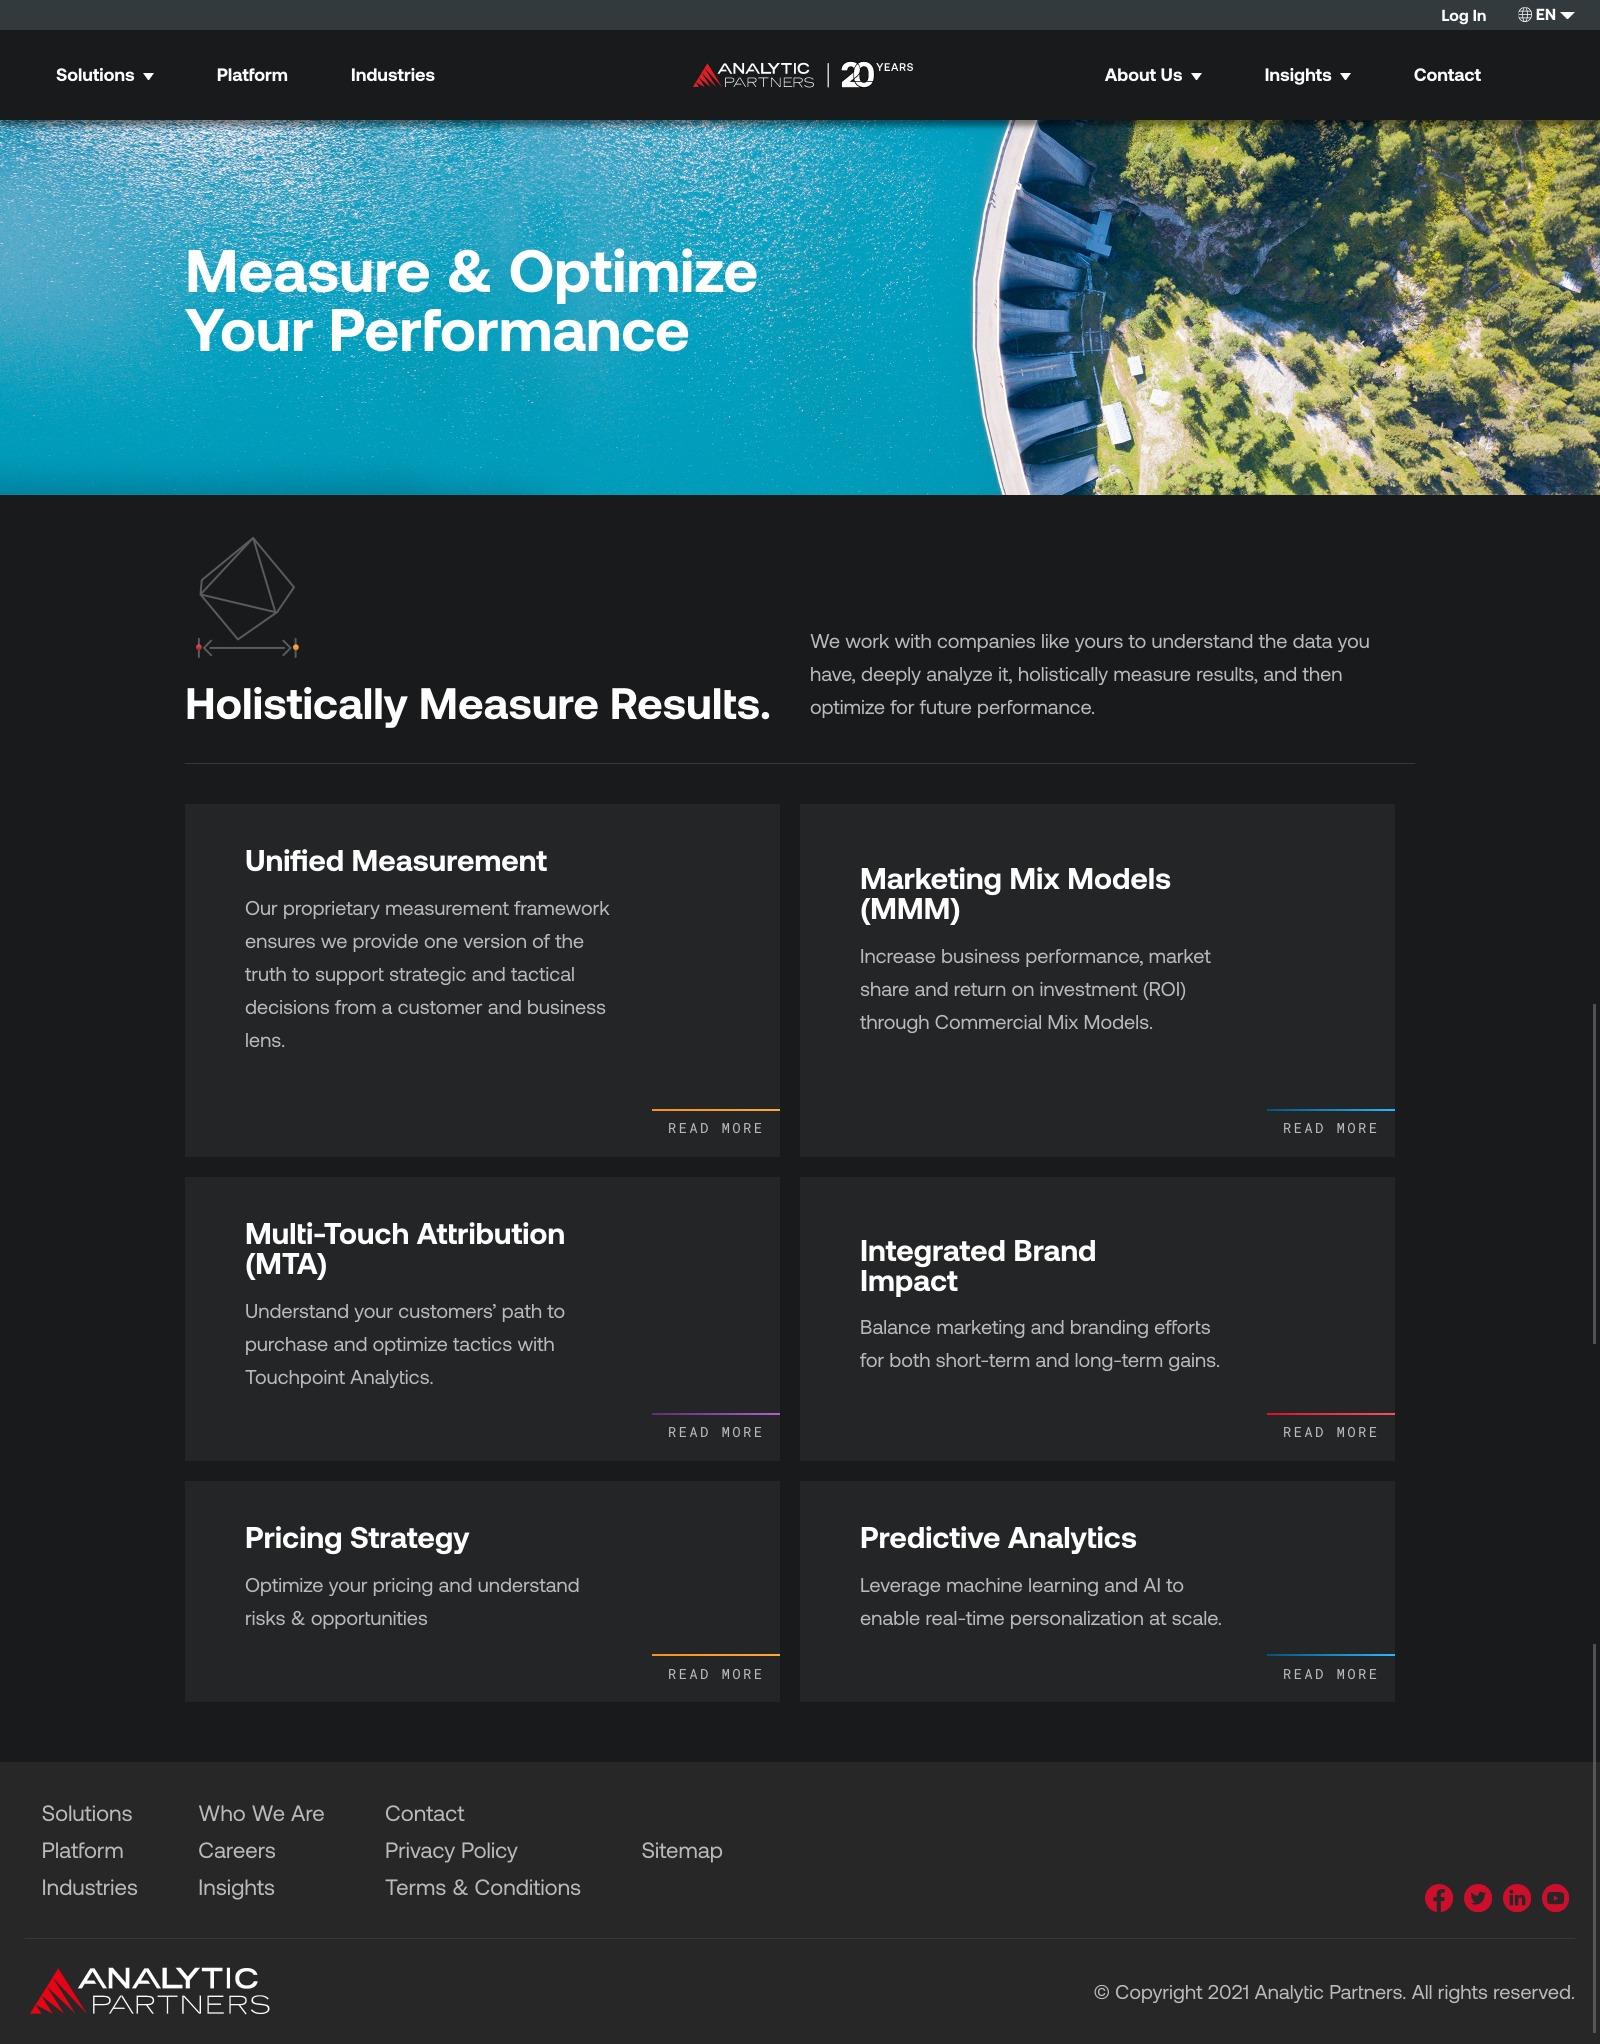 screencapture-analyticpartners-measure-optimize-2021-05-23-19_22_43 (1)